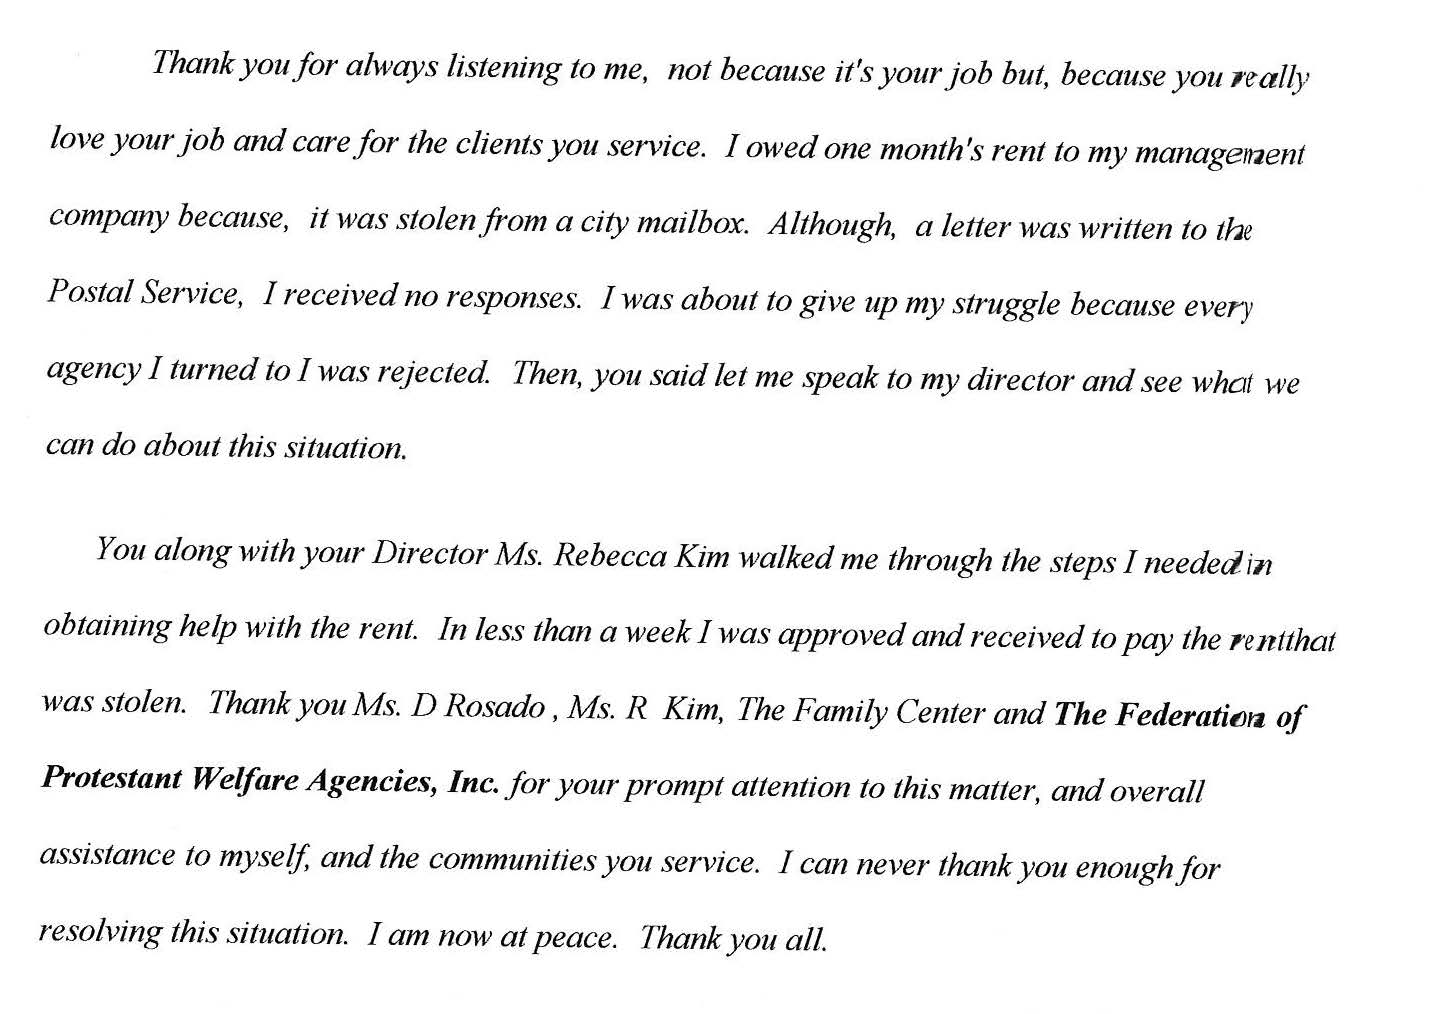 letter-of-appreciation-from-client-to-deborah-rosado-3-2-17